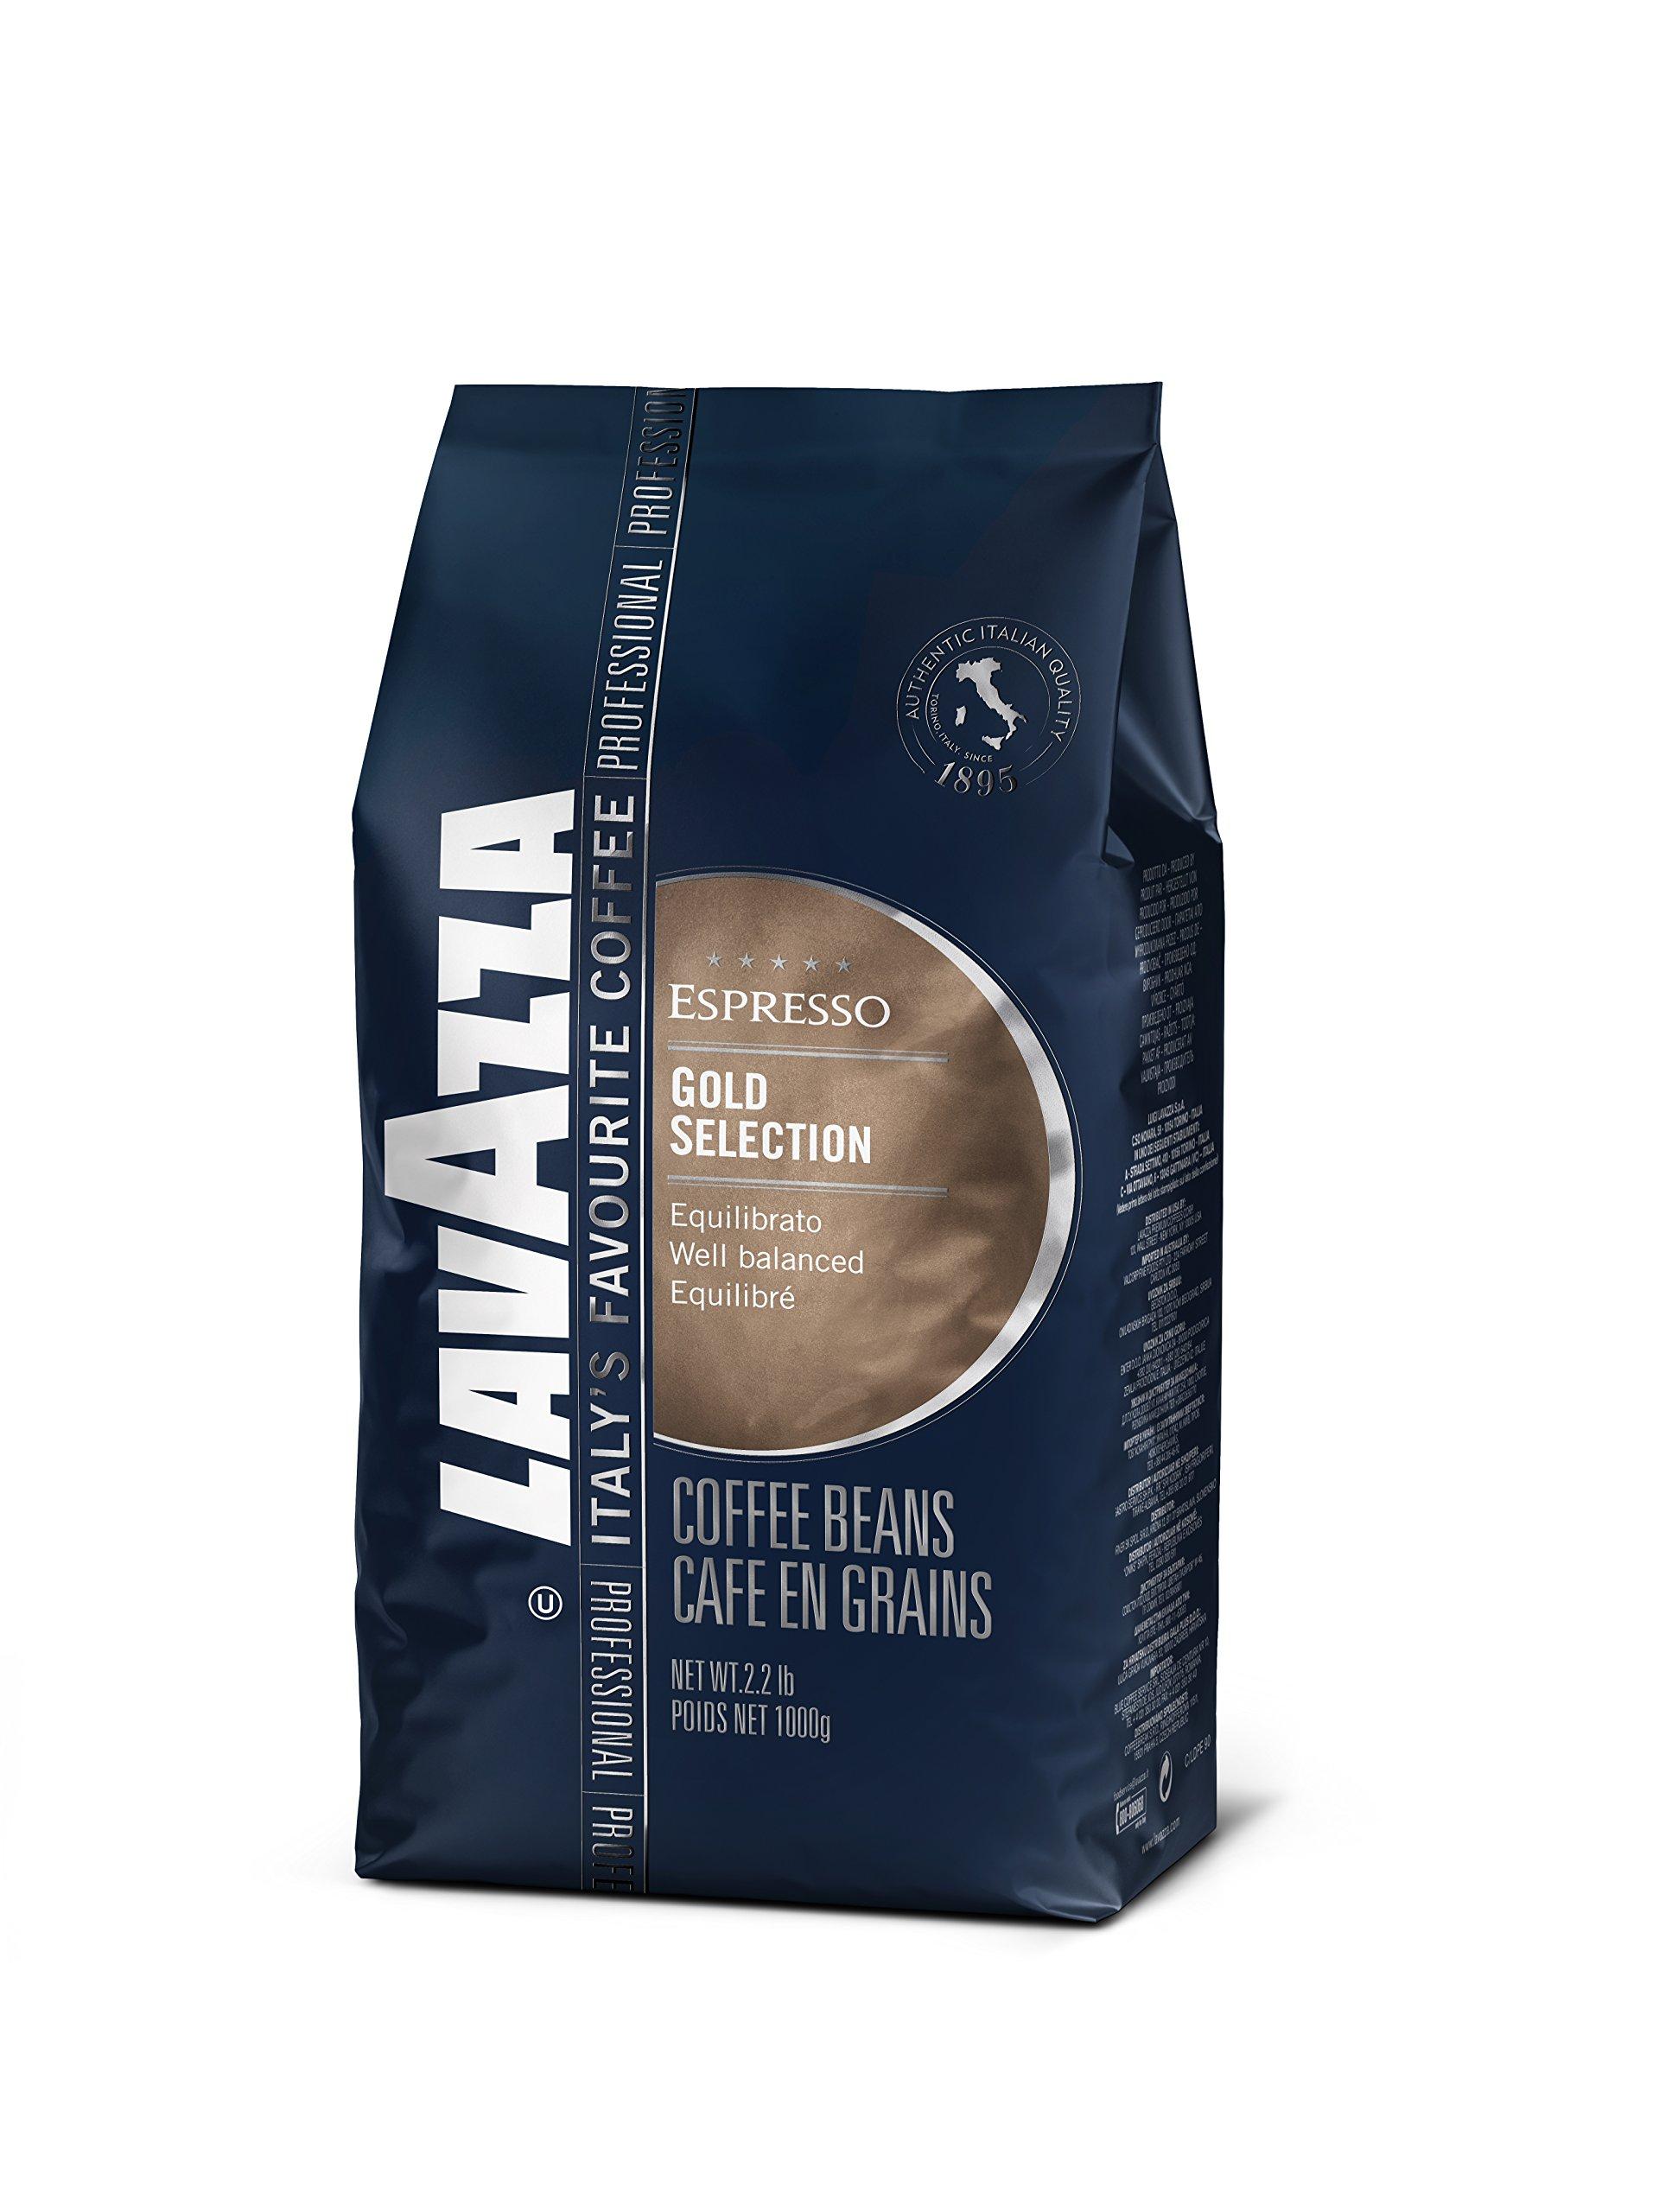 Lavazza Gold Selection Whole Bean Coffee Blend, Medium Espresso Roast, 2.2-Pound Bag